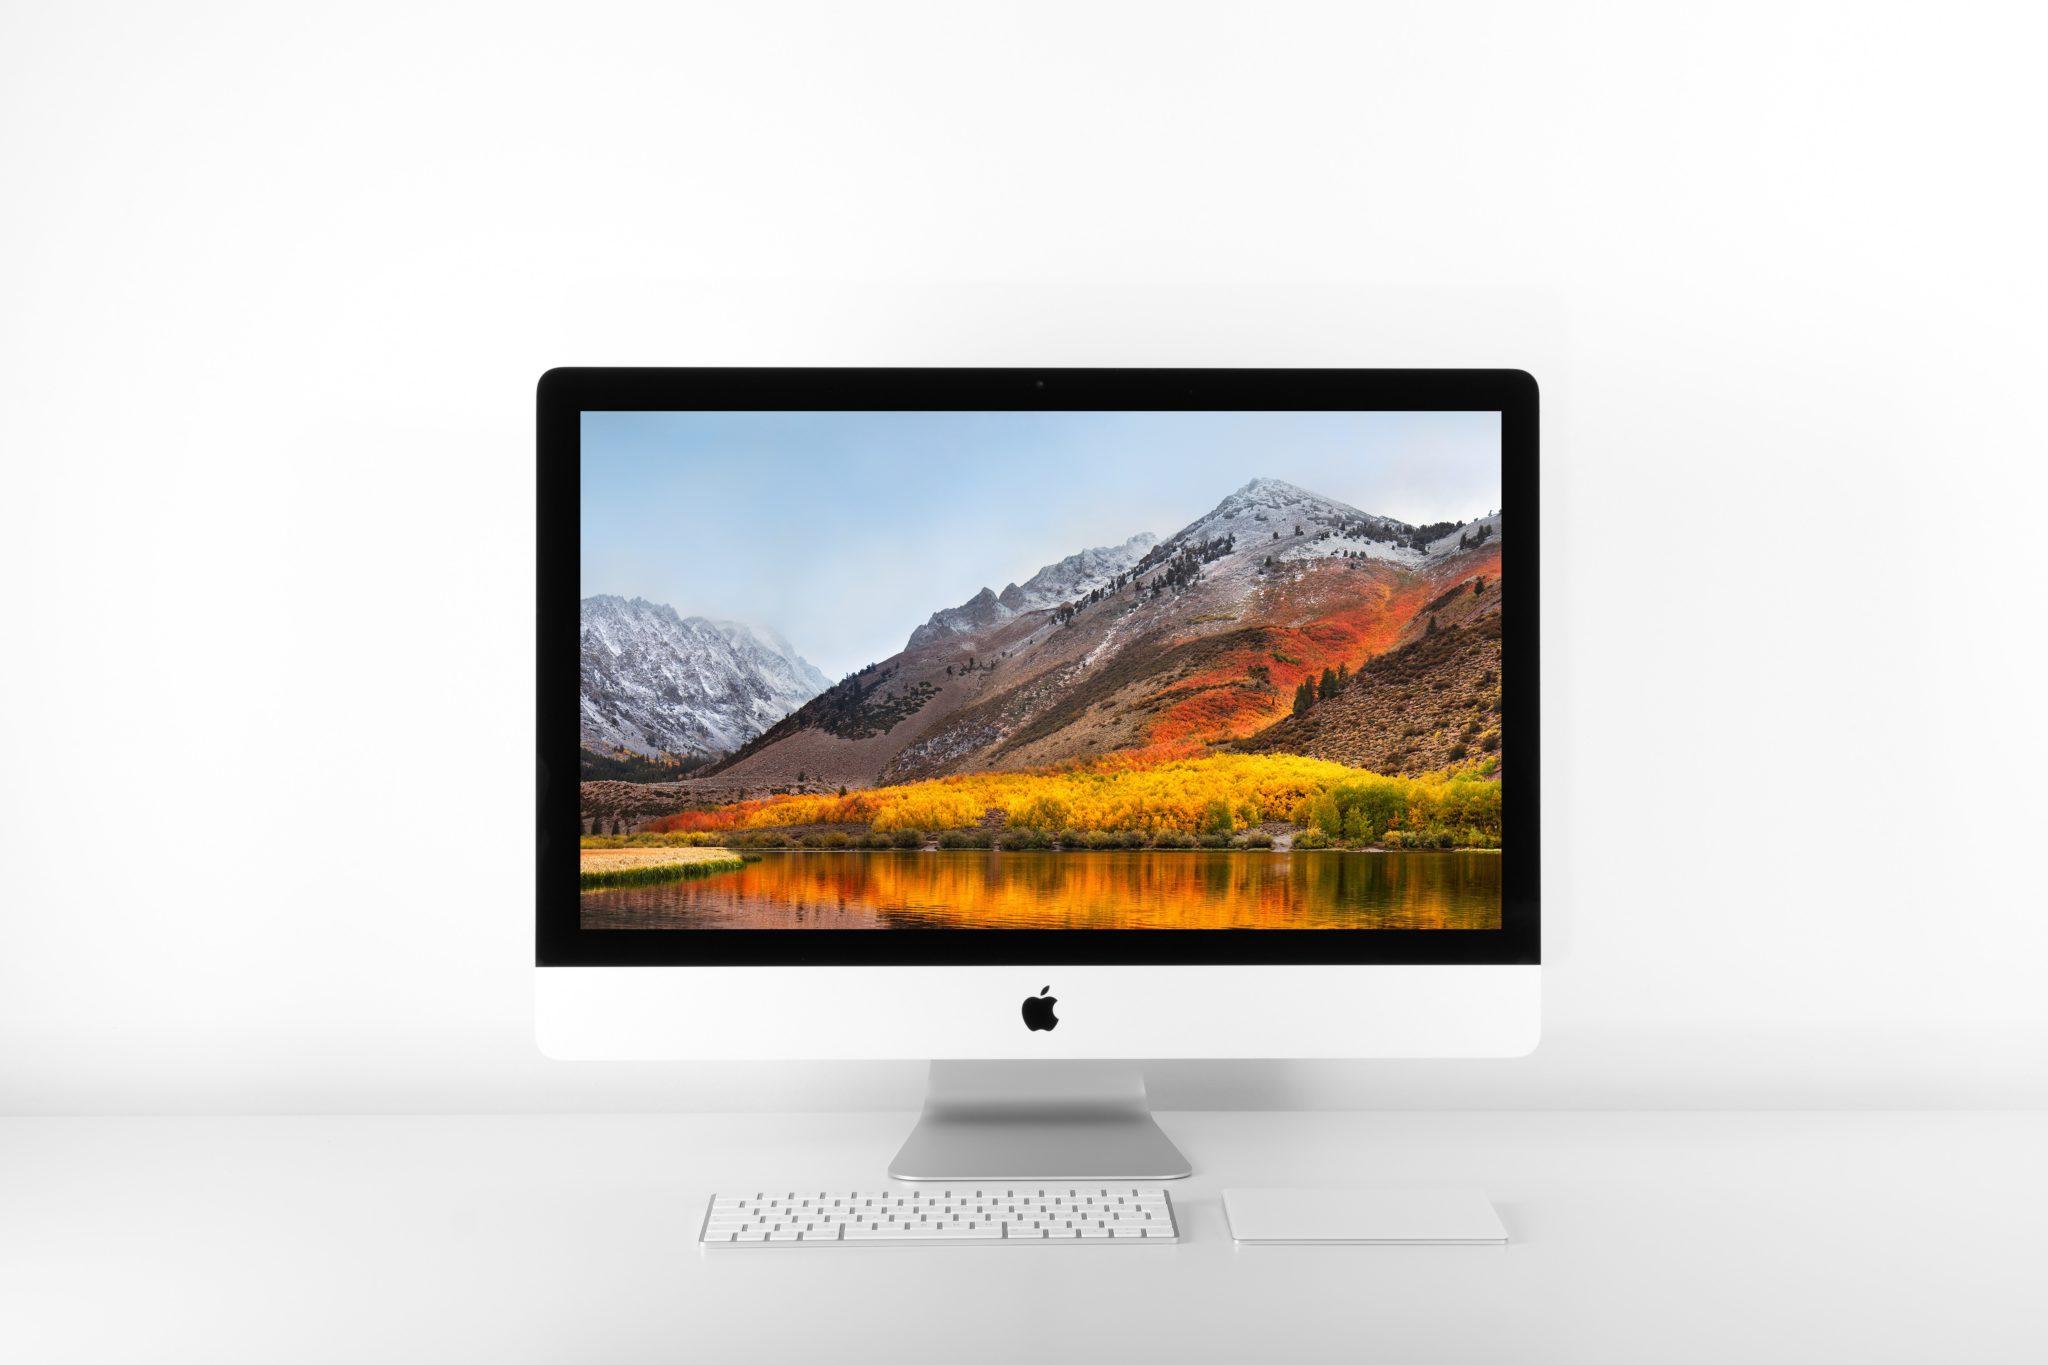 Macbook & iMac Image